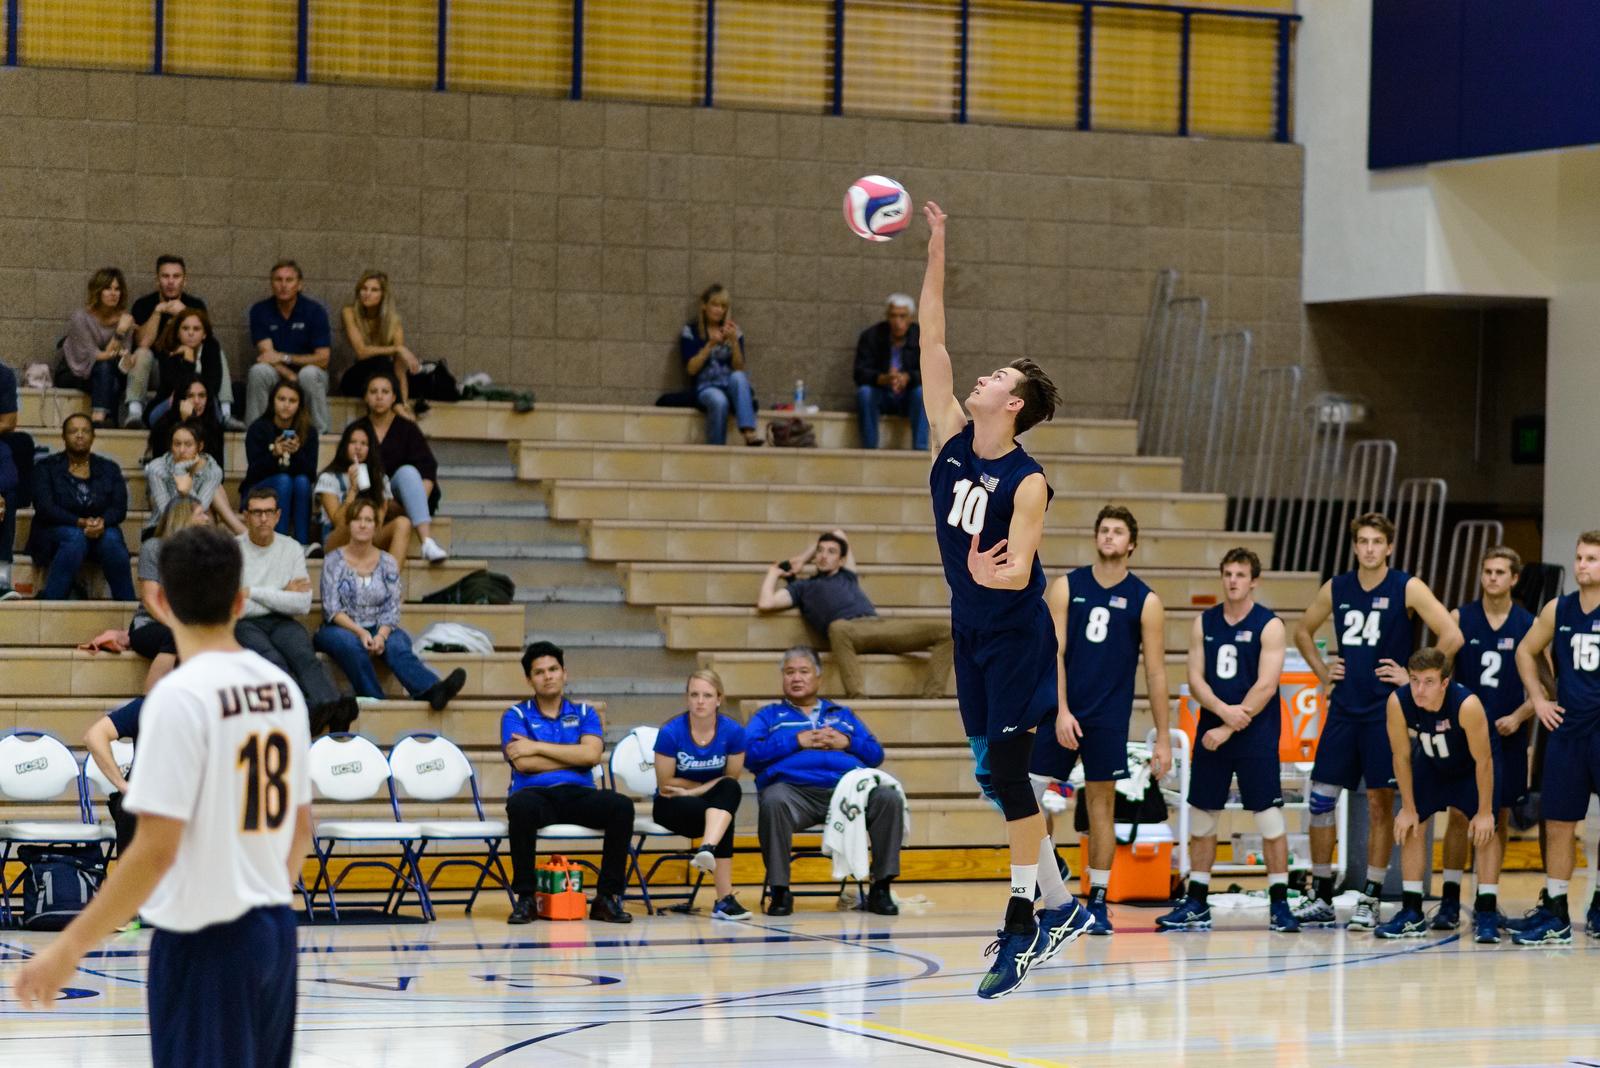 Jacob Delson serves a jump serve.